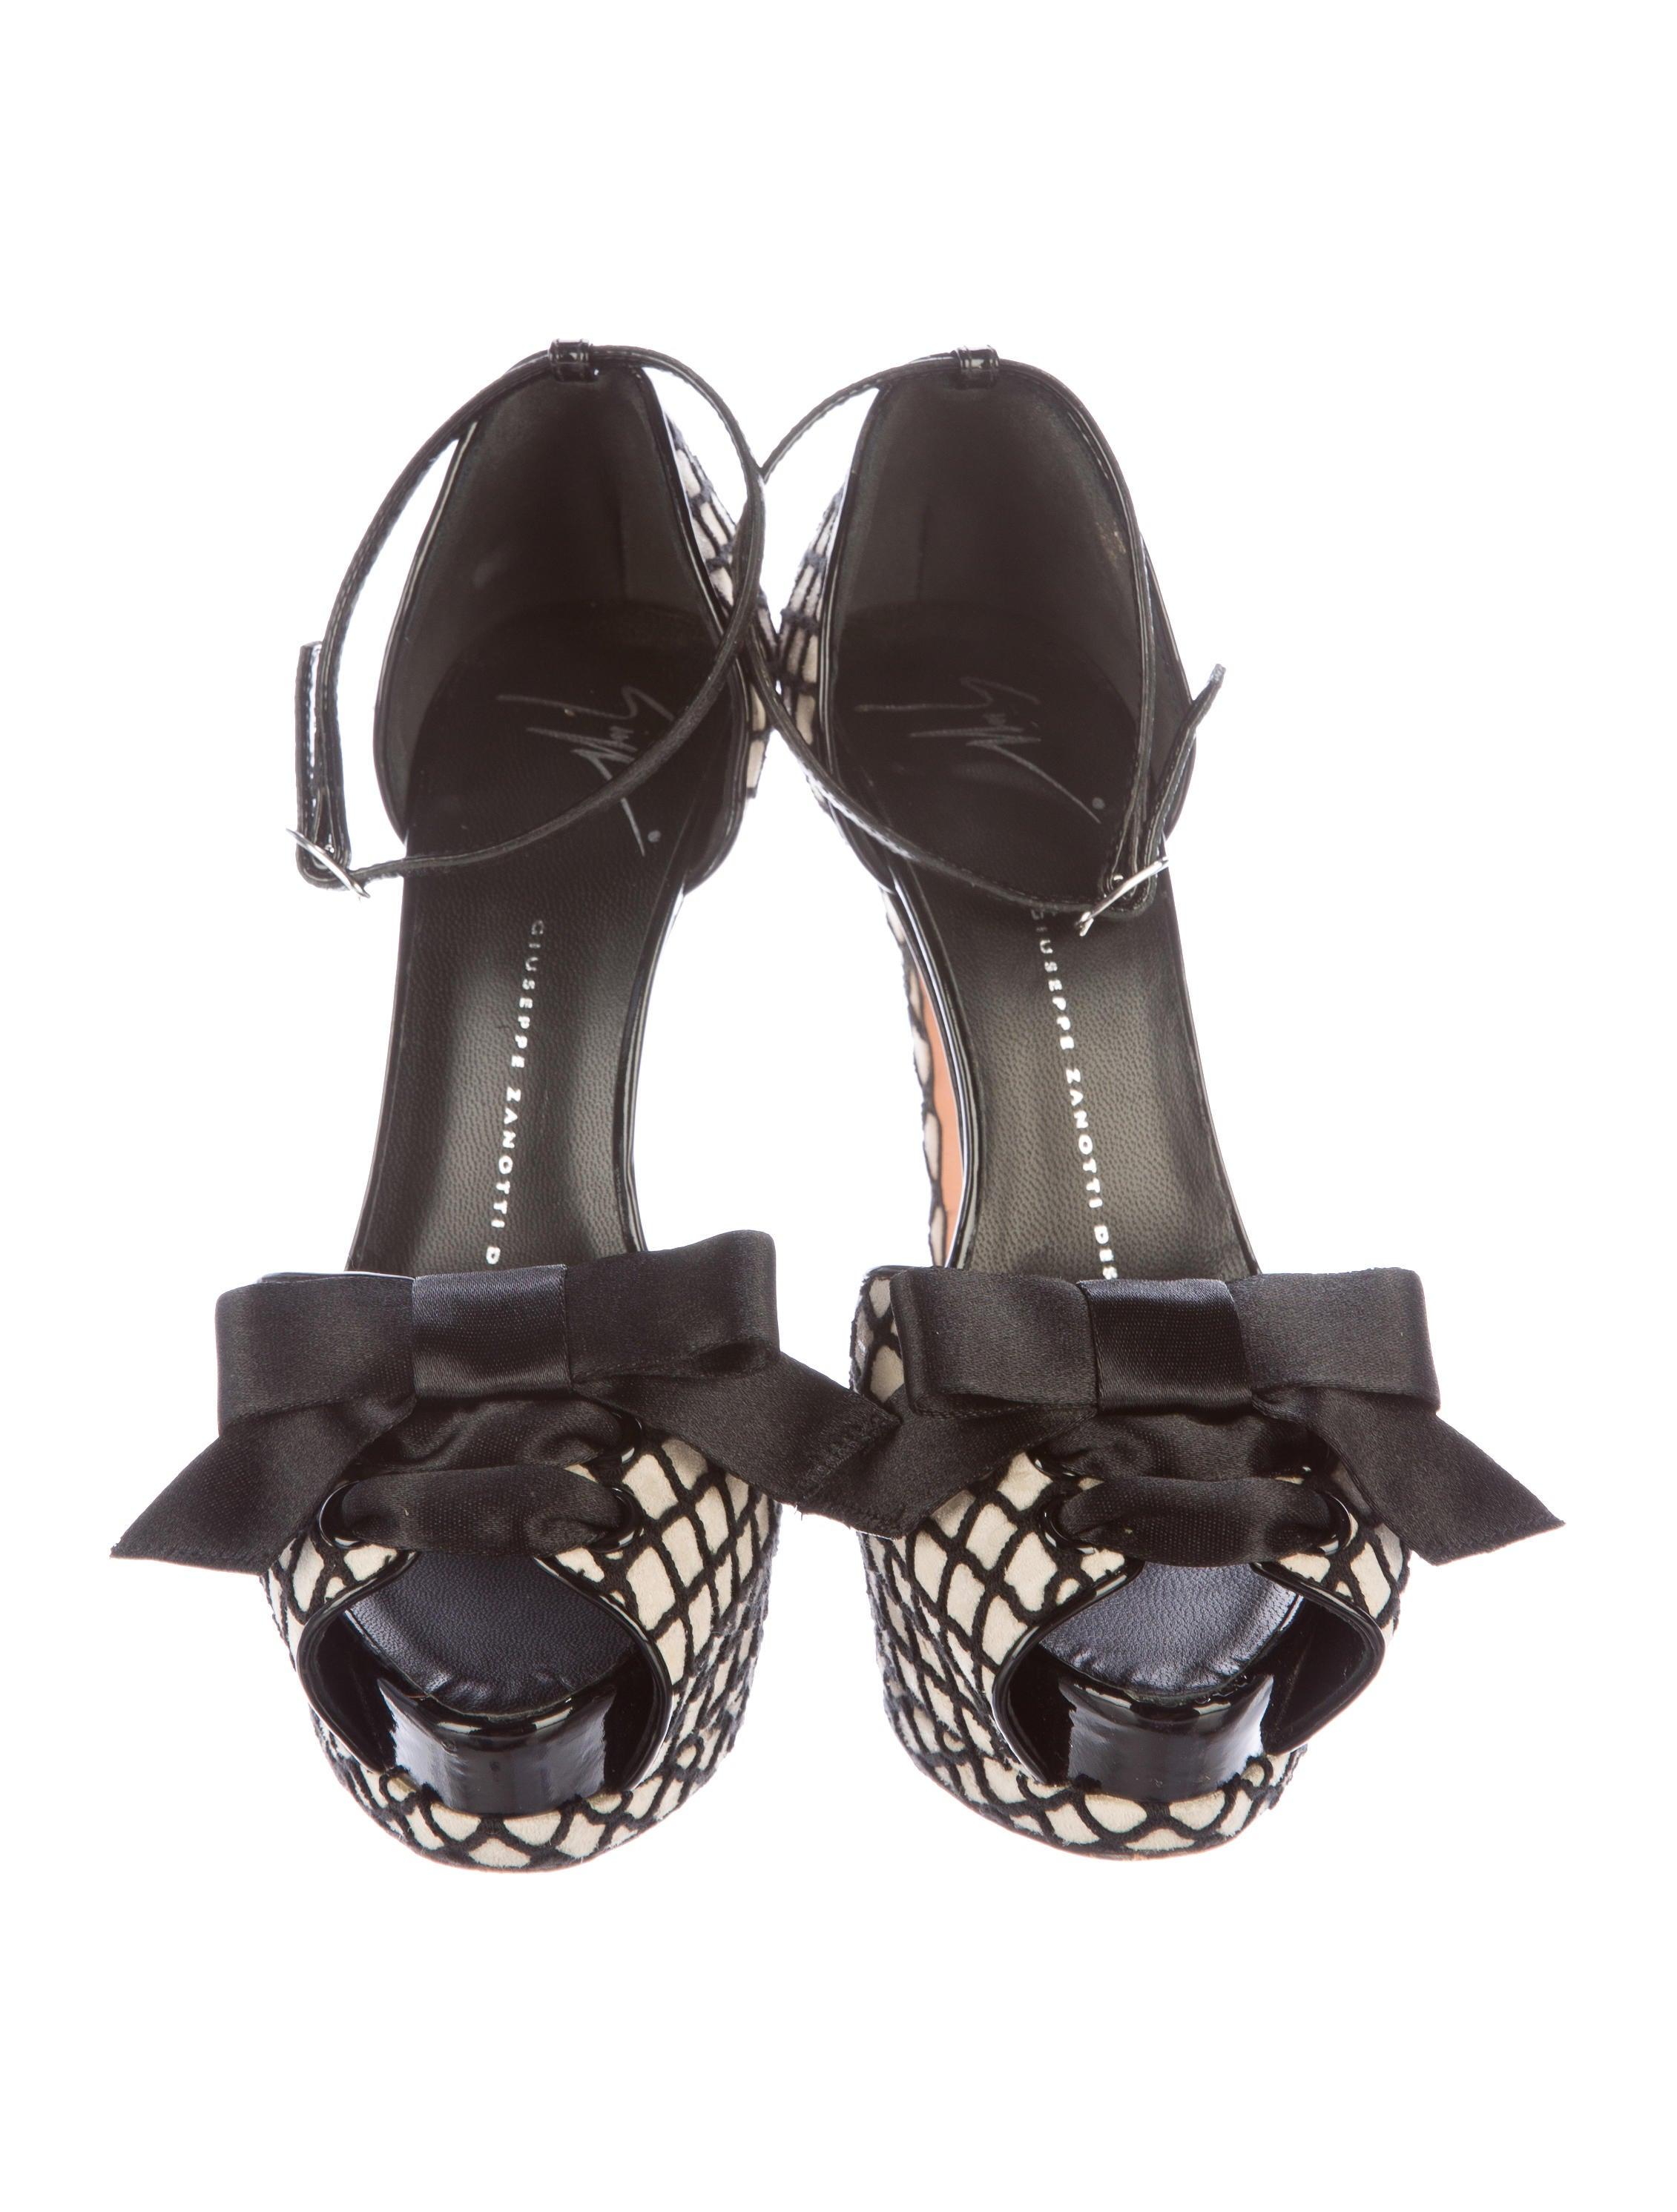 Giuseppe Zanotti du0026#39;Orsay Platform Pumps - Shoes - GIU35774 : The RealReal